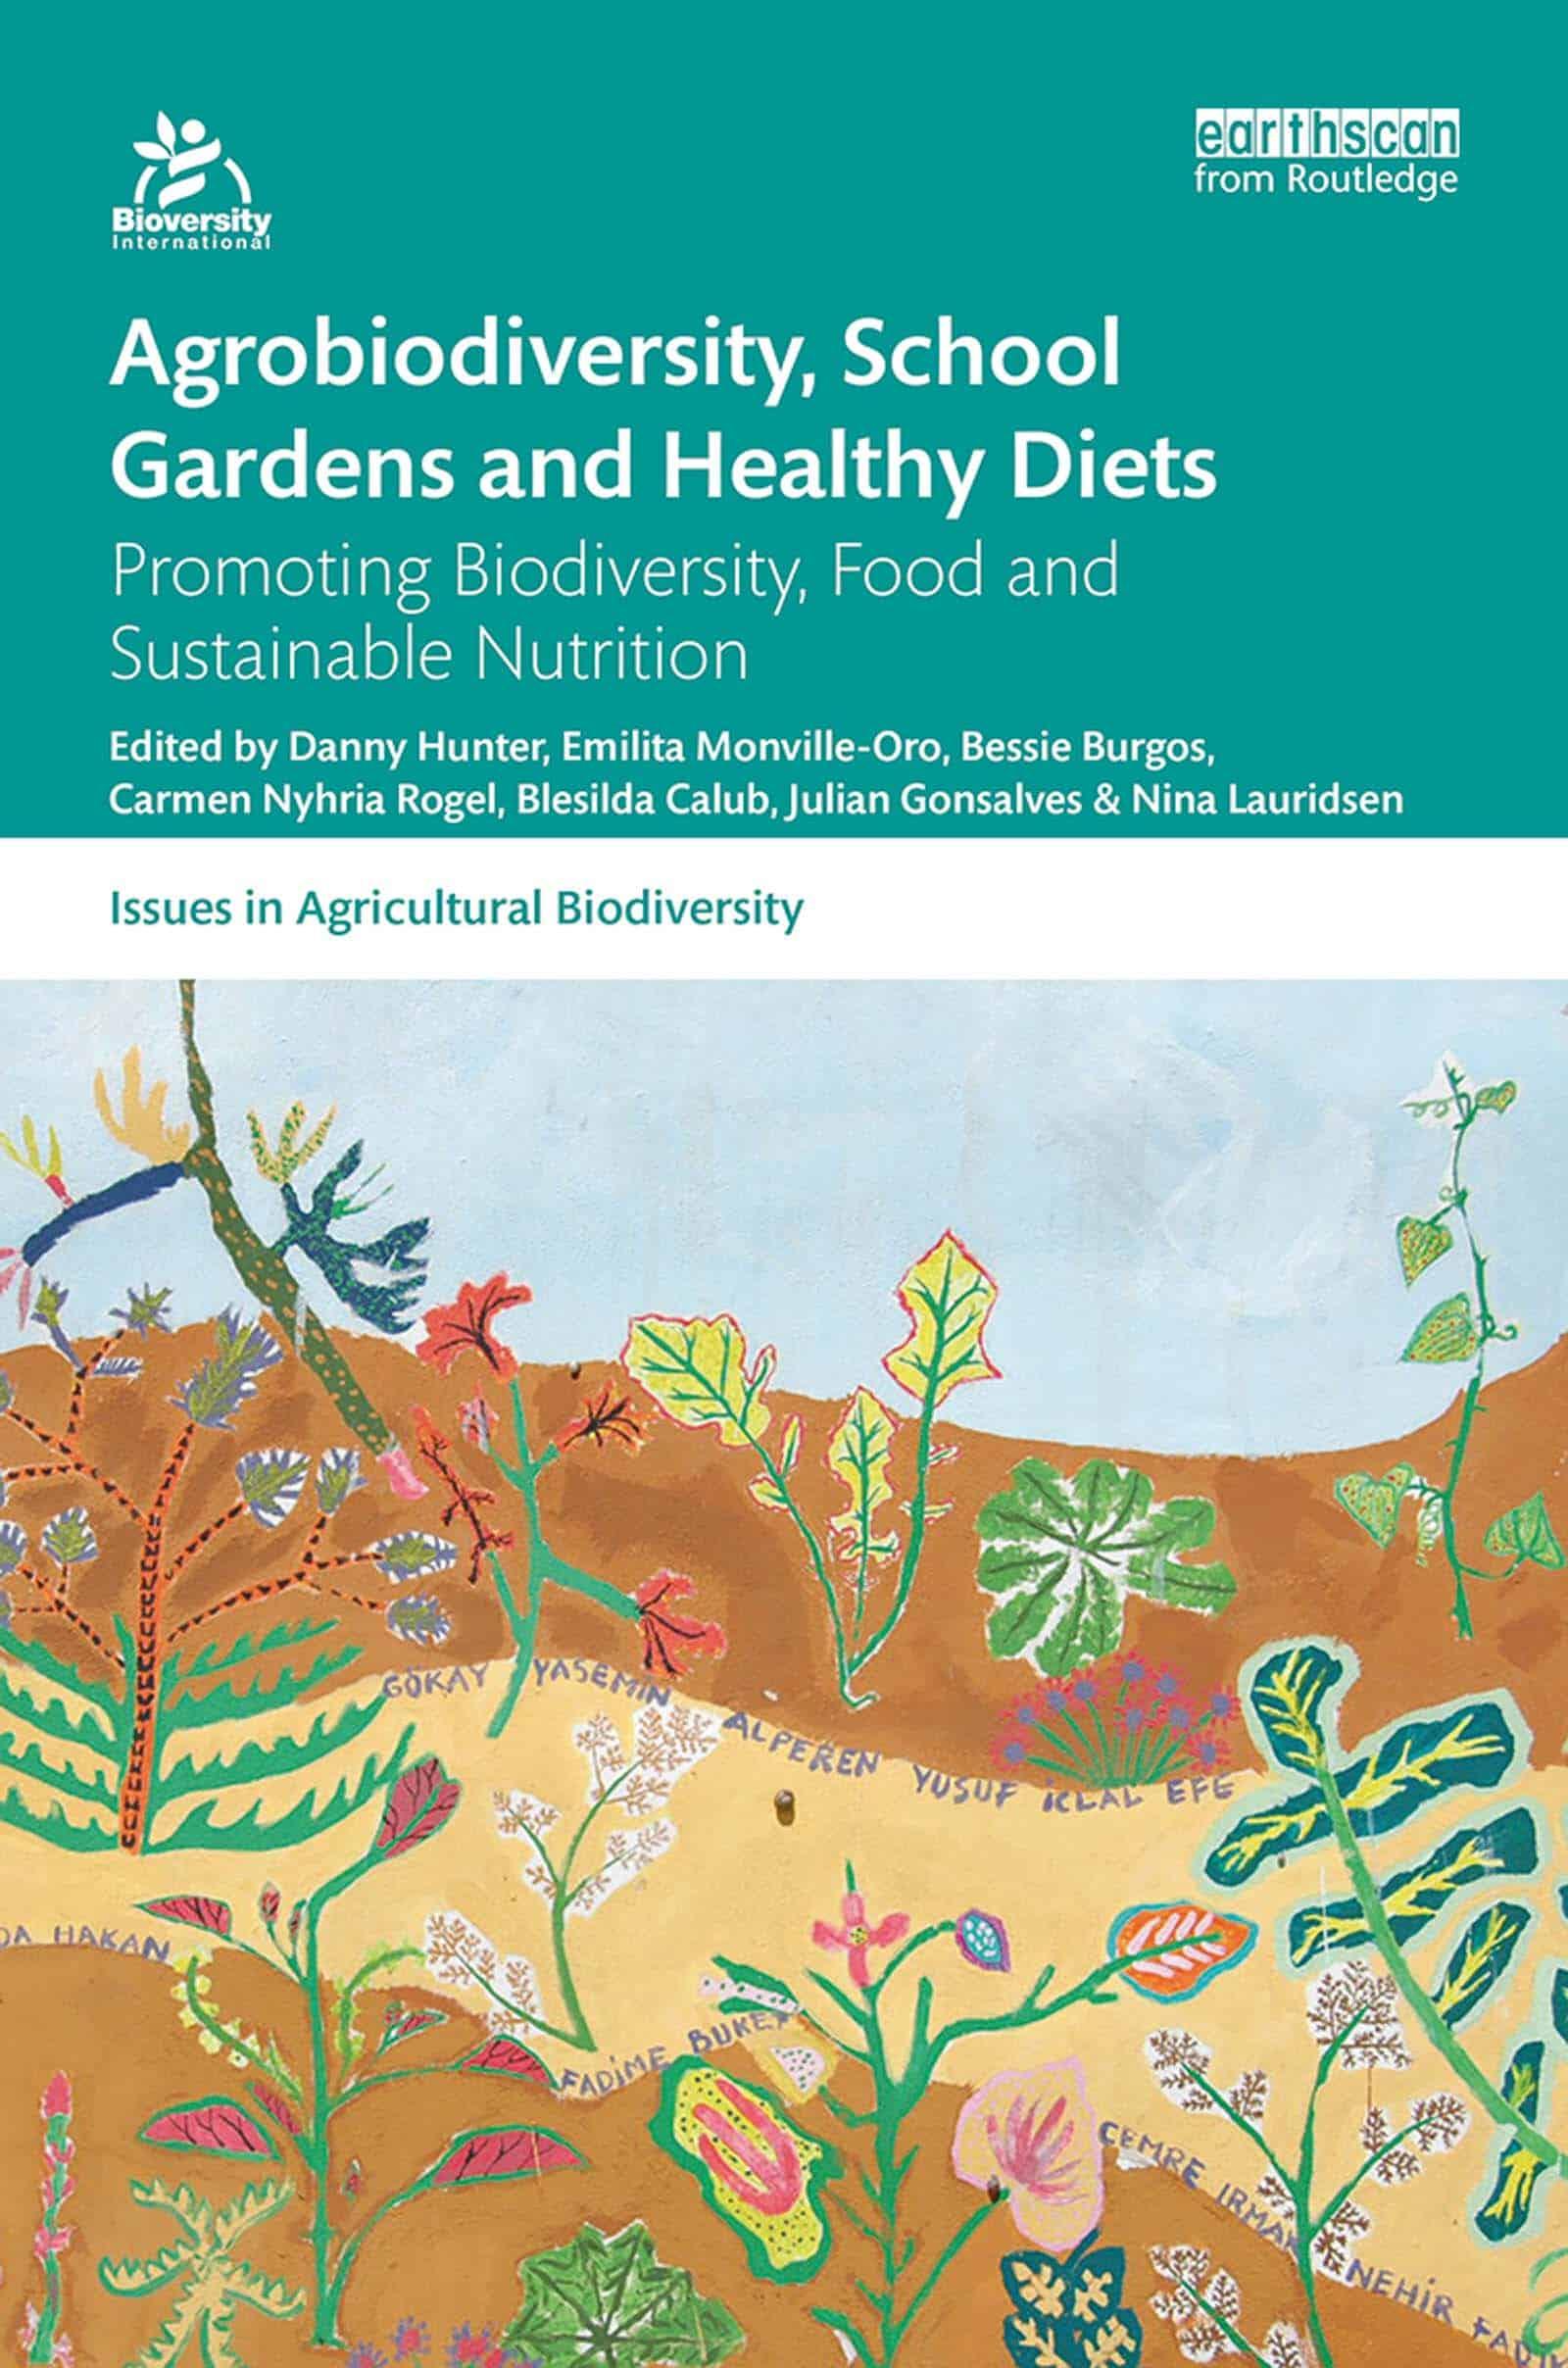 Bioversity International - Agrobiodiversity, School Gardens and Healthy Diets